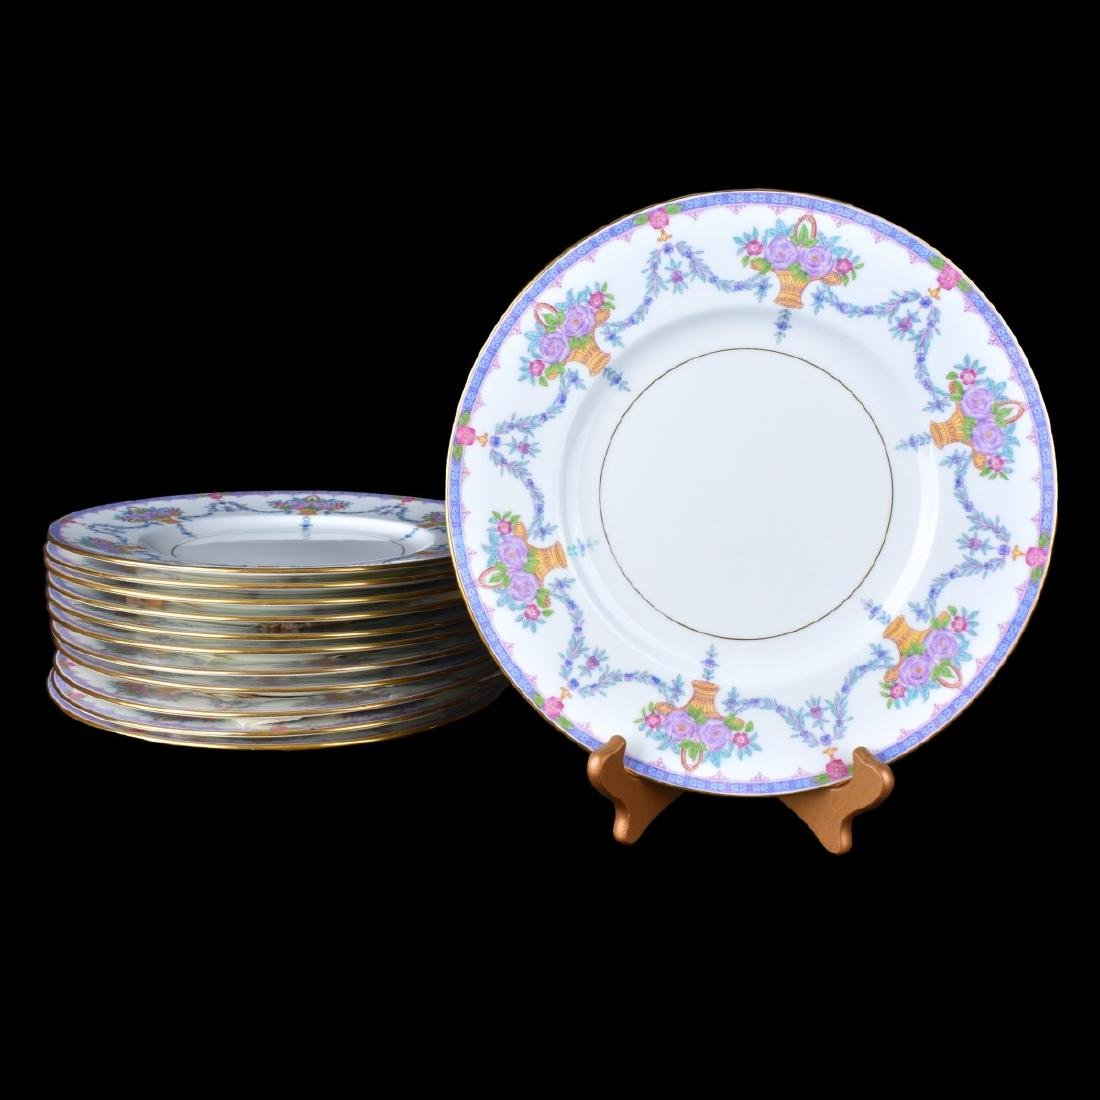 Set of Twelve (12) Minton English Porcelain Plates